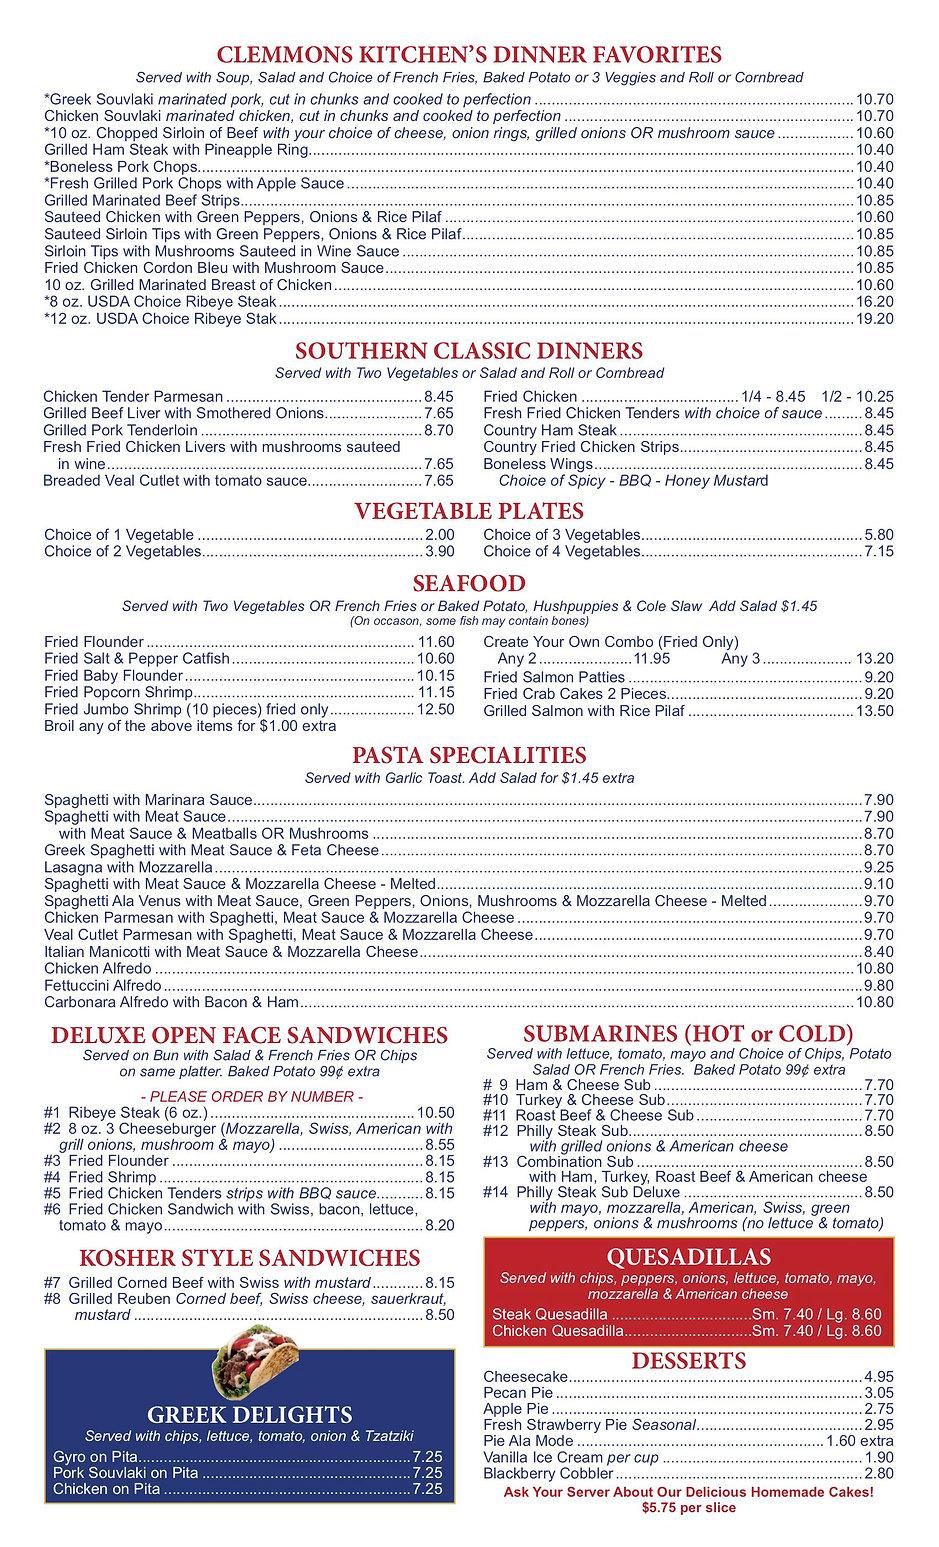 Clemmons Kitchen menu 20213.jpg